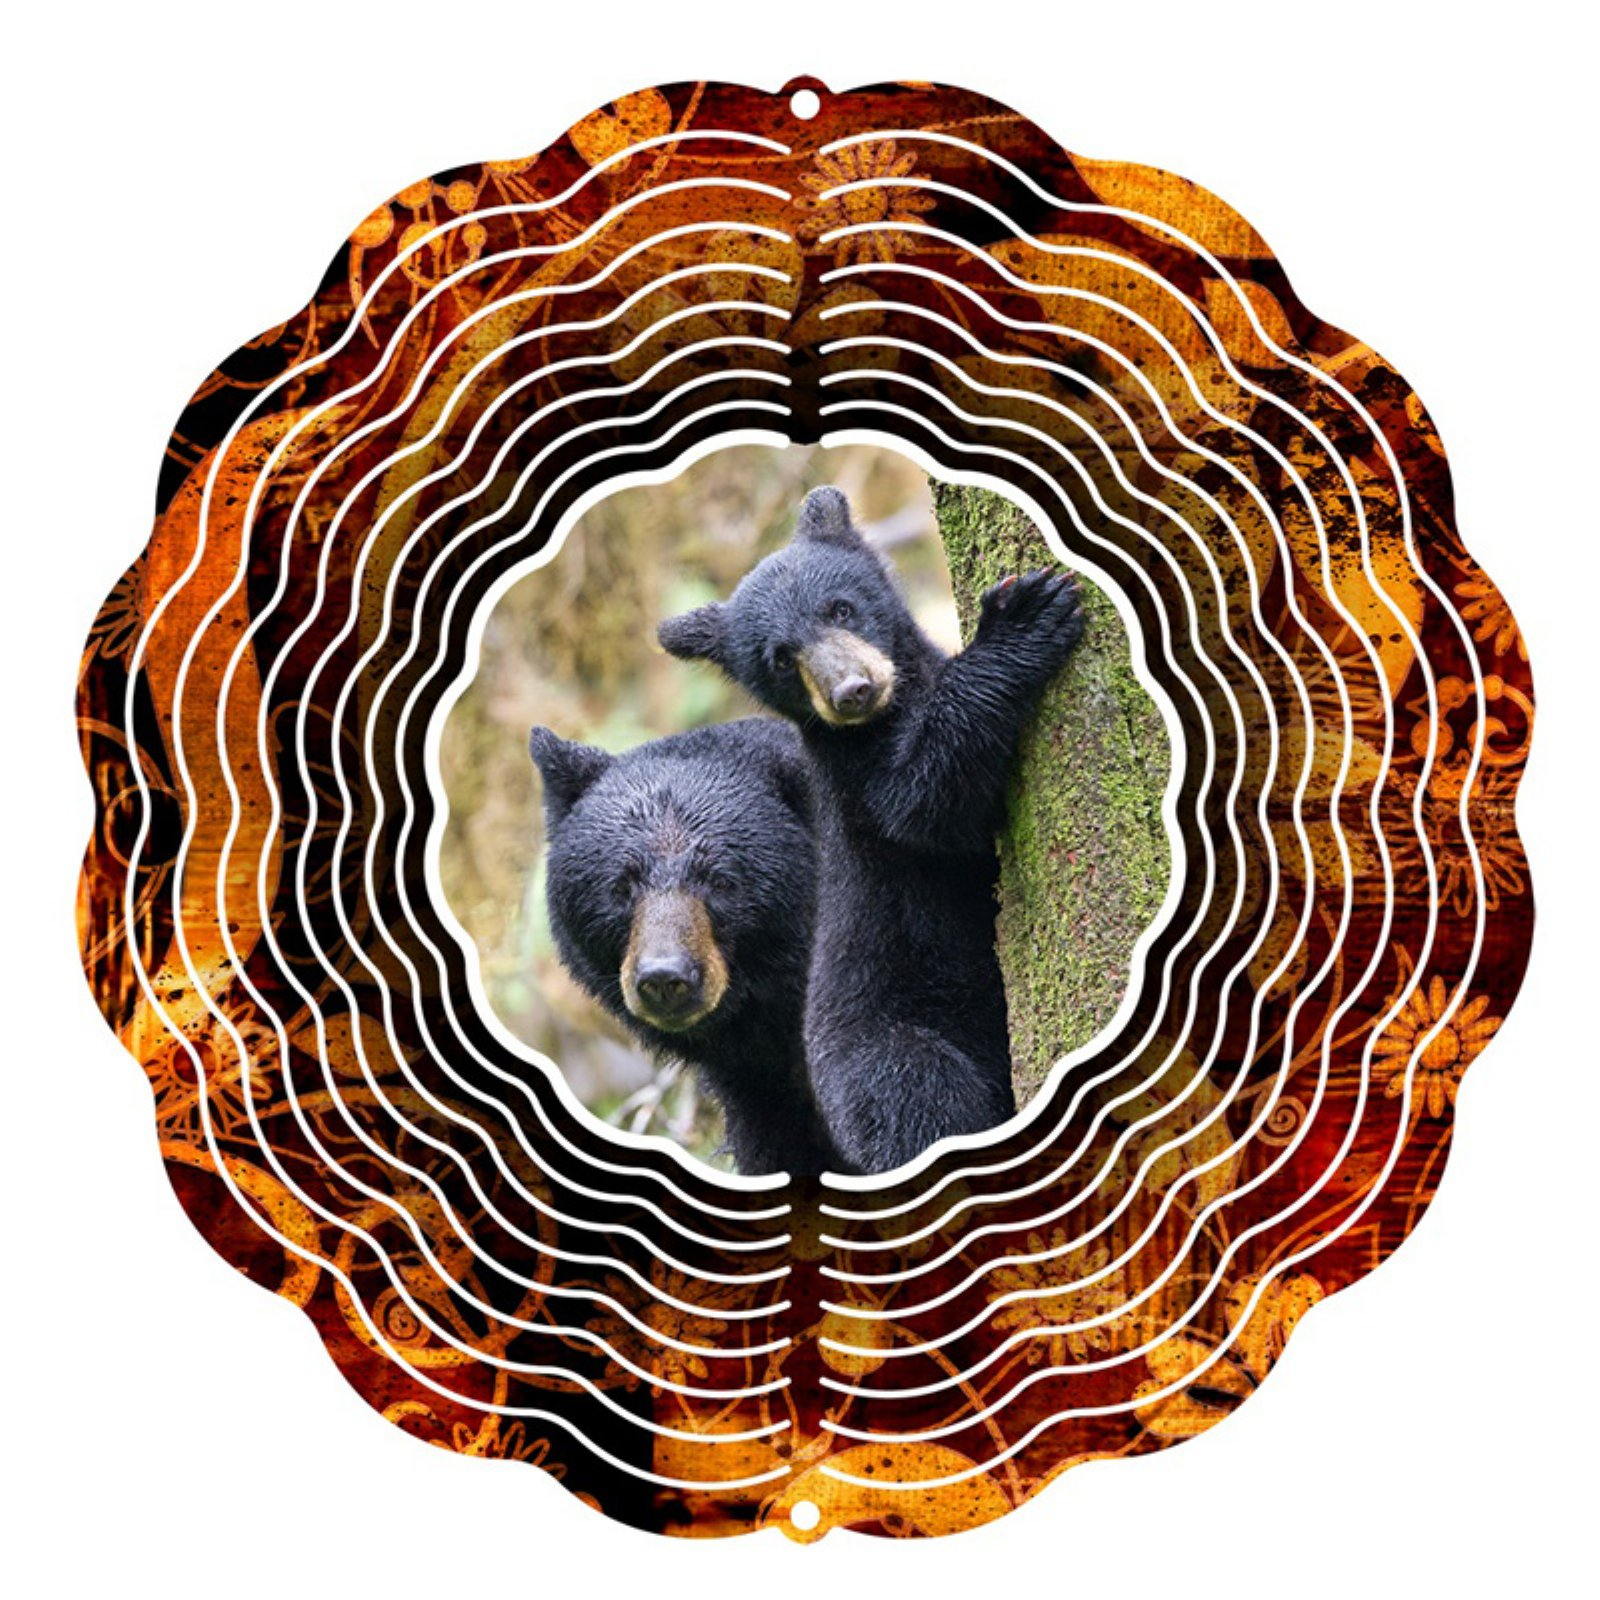 Next Innovations 10 in. Black Bear Wind Spinner by Next Innovations